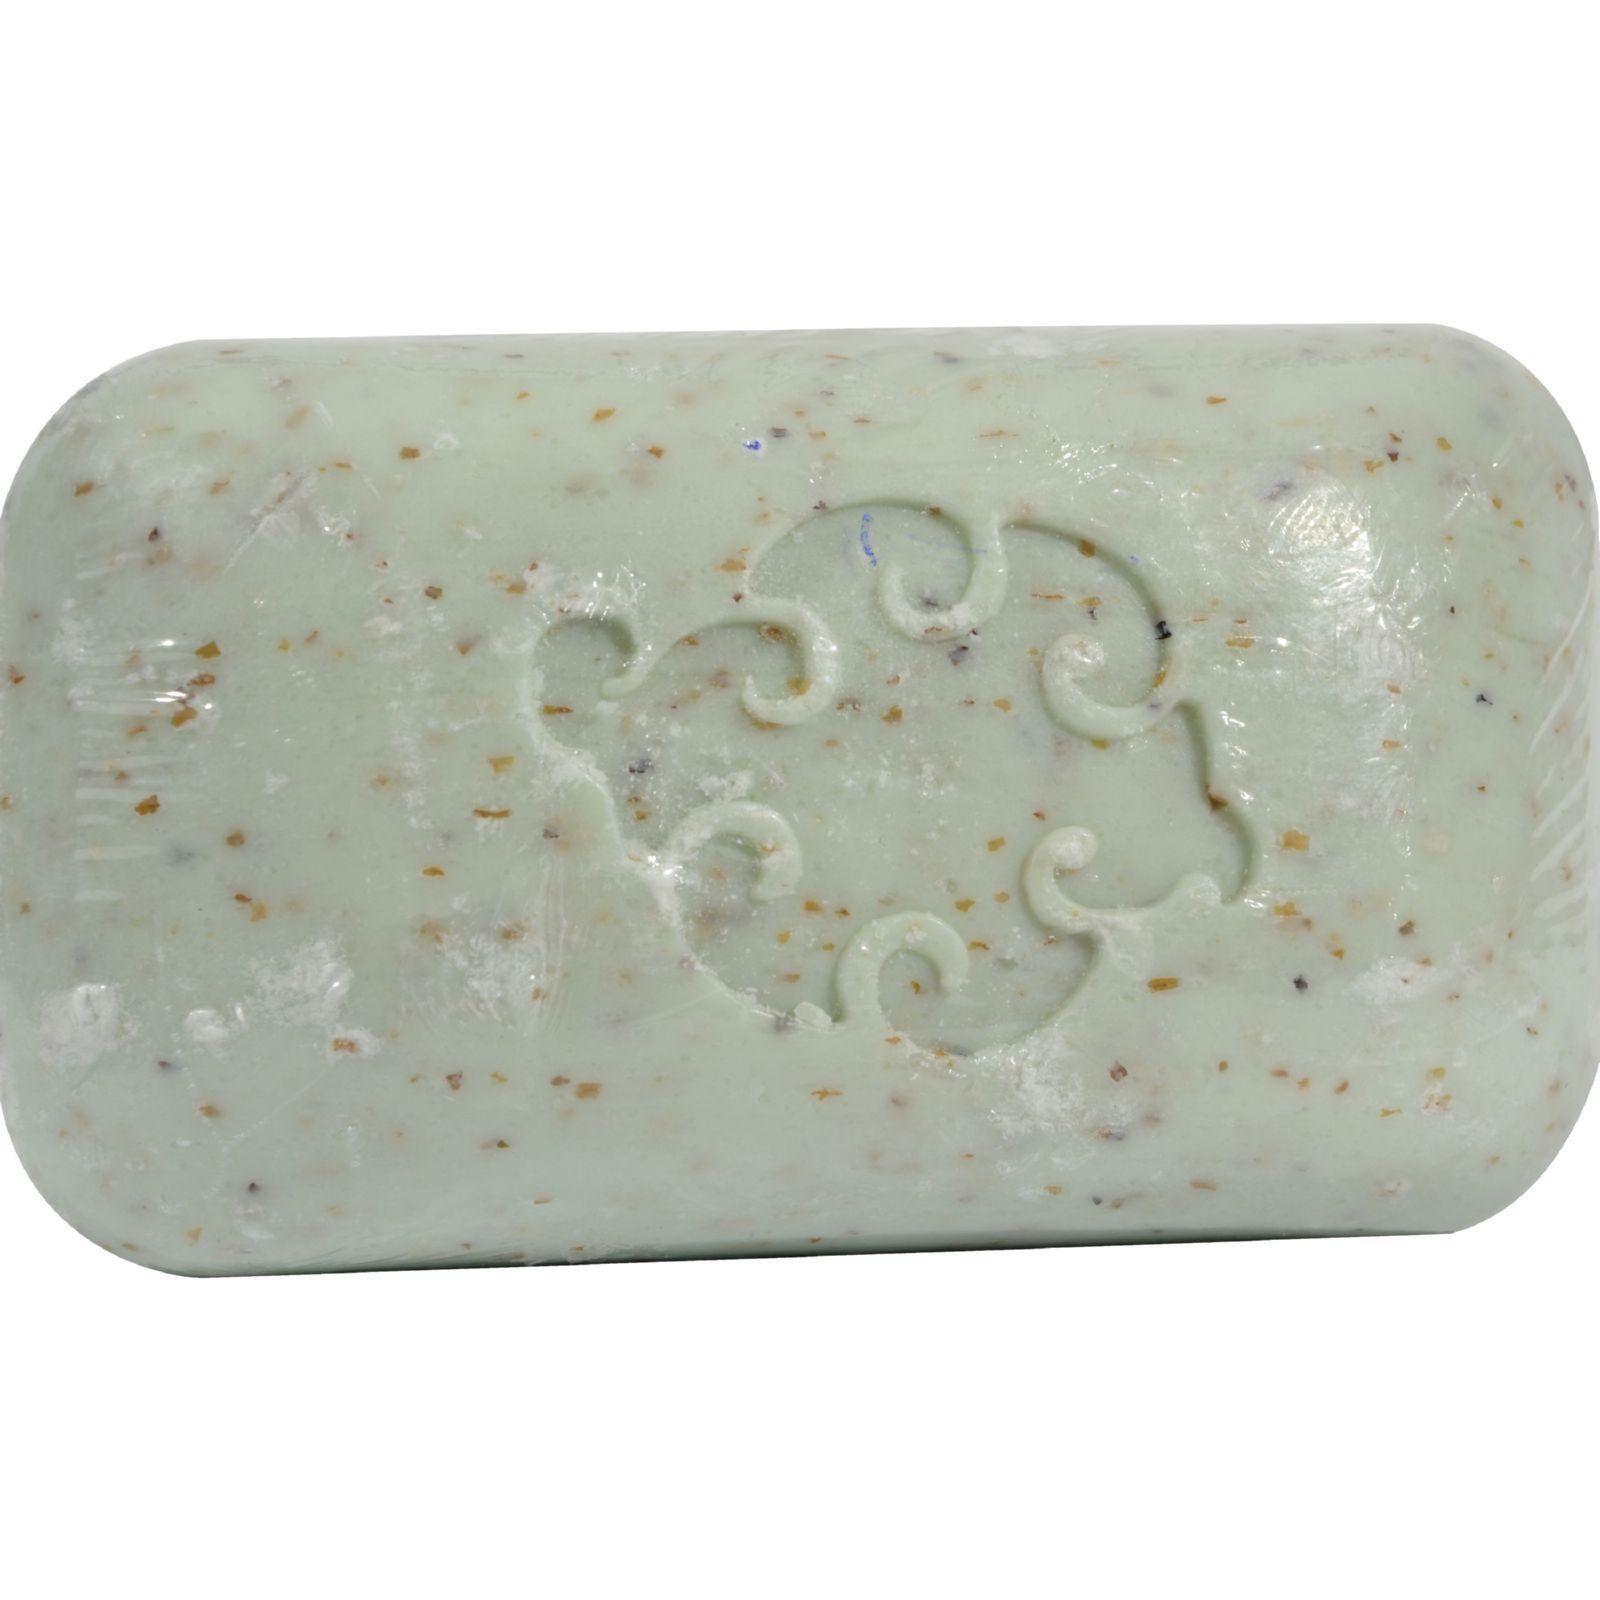 Baudelaire Hand Soap Loofa Mint - 5 oz